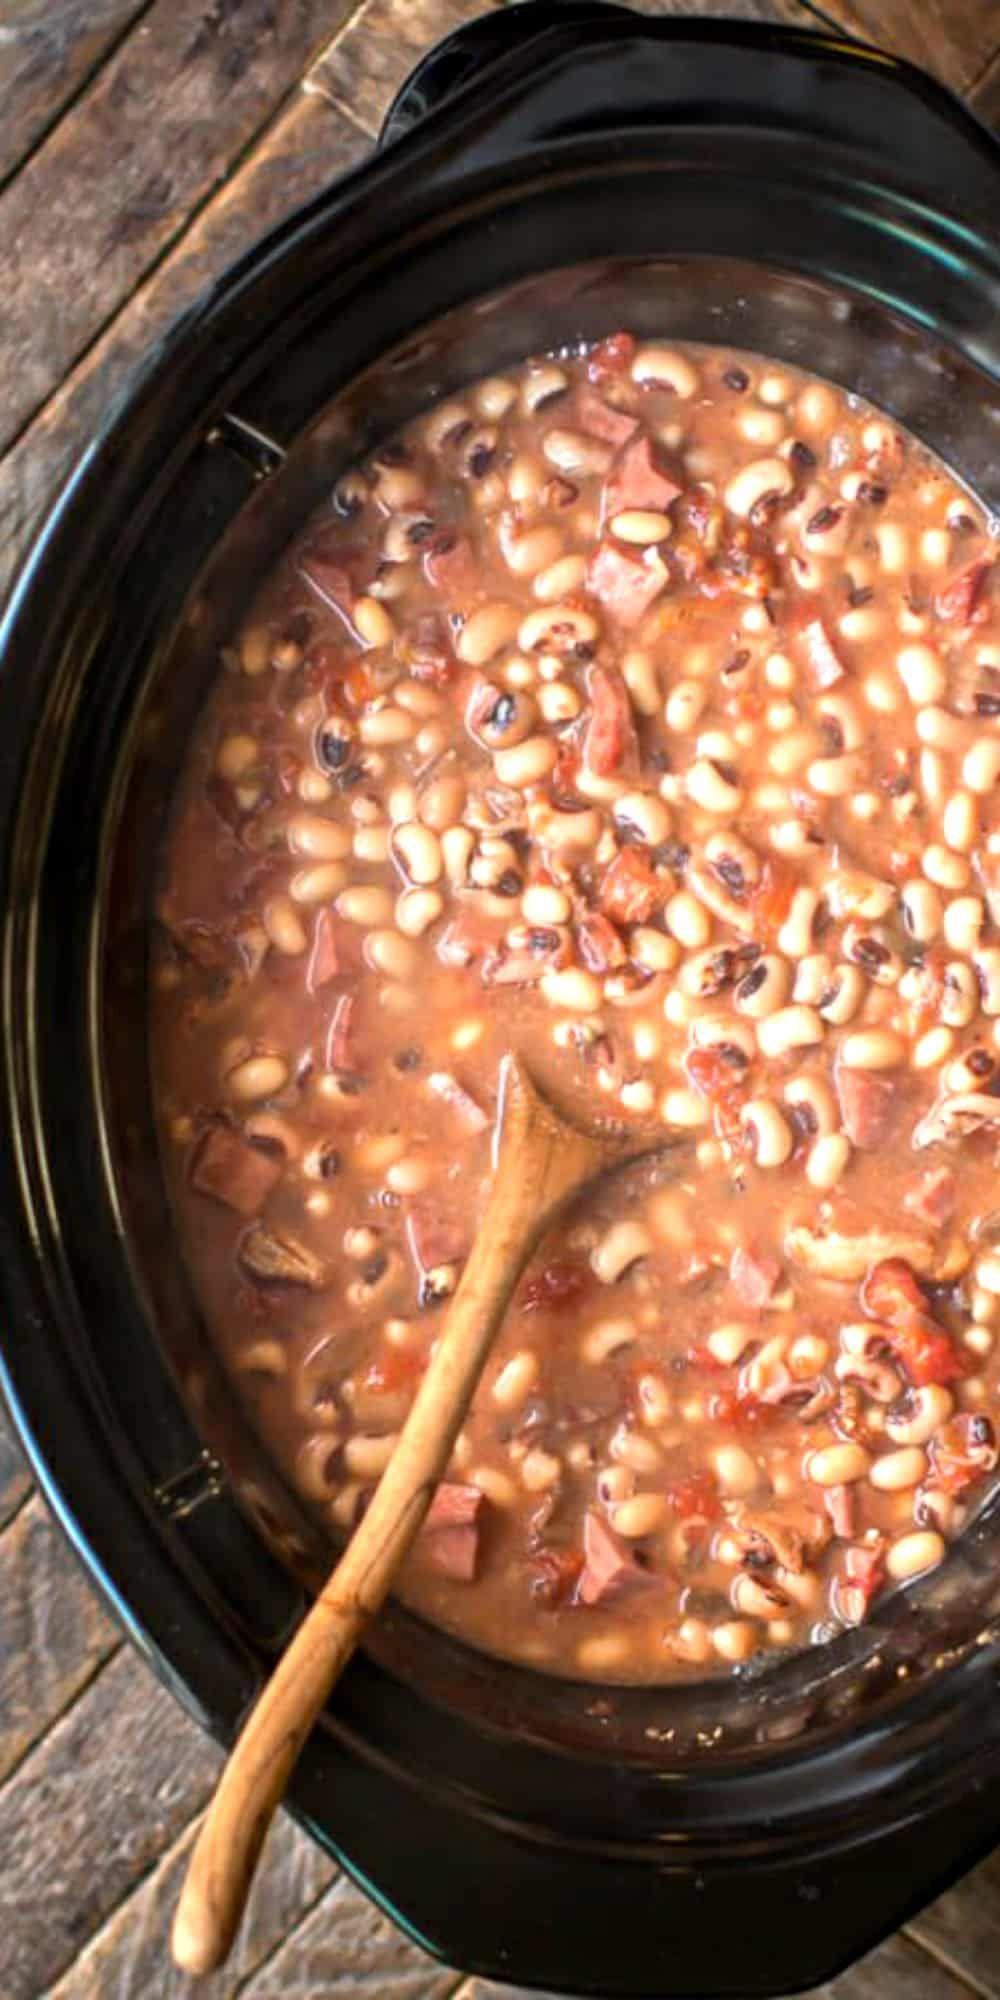 New Year's BlackEyed Peas Recipe Black eyed peas